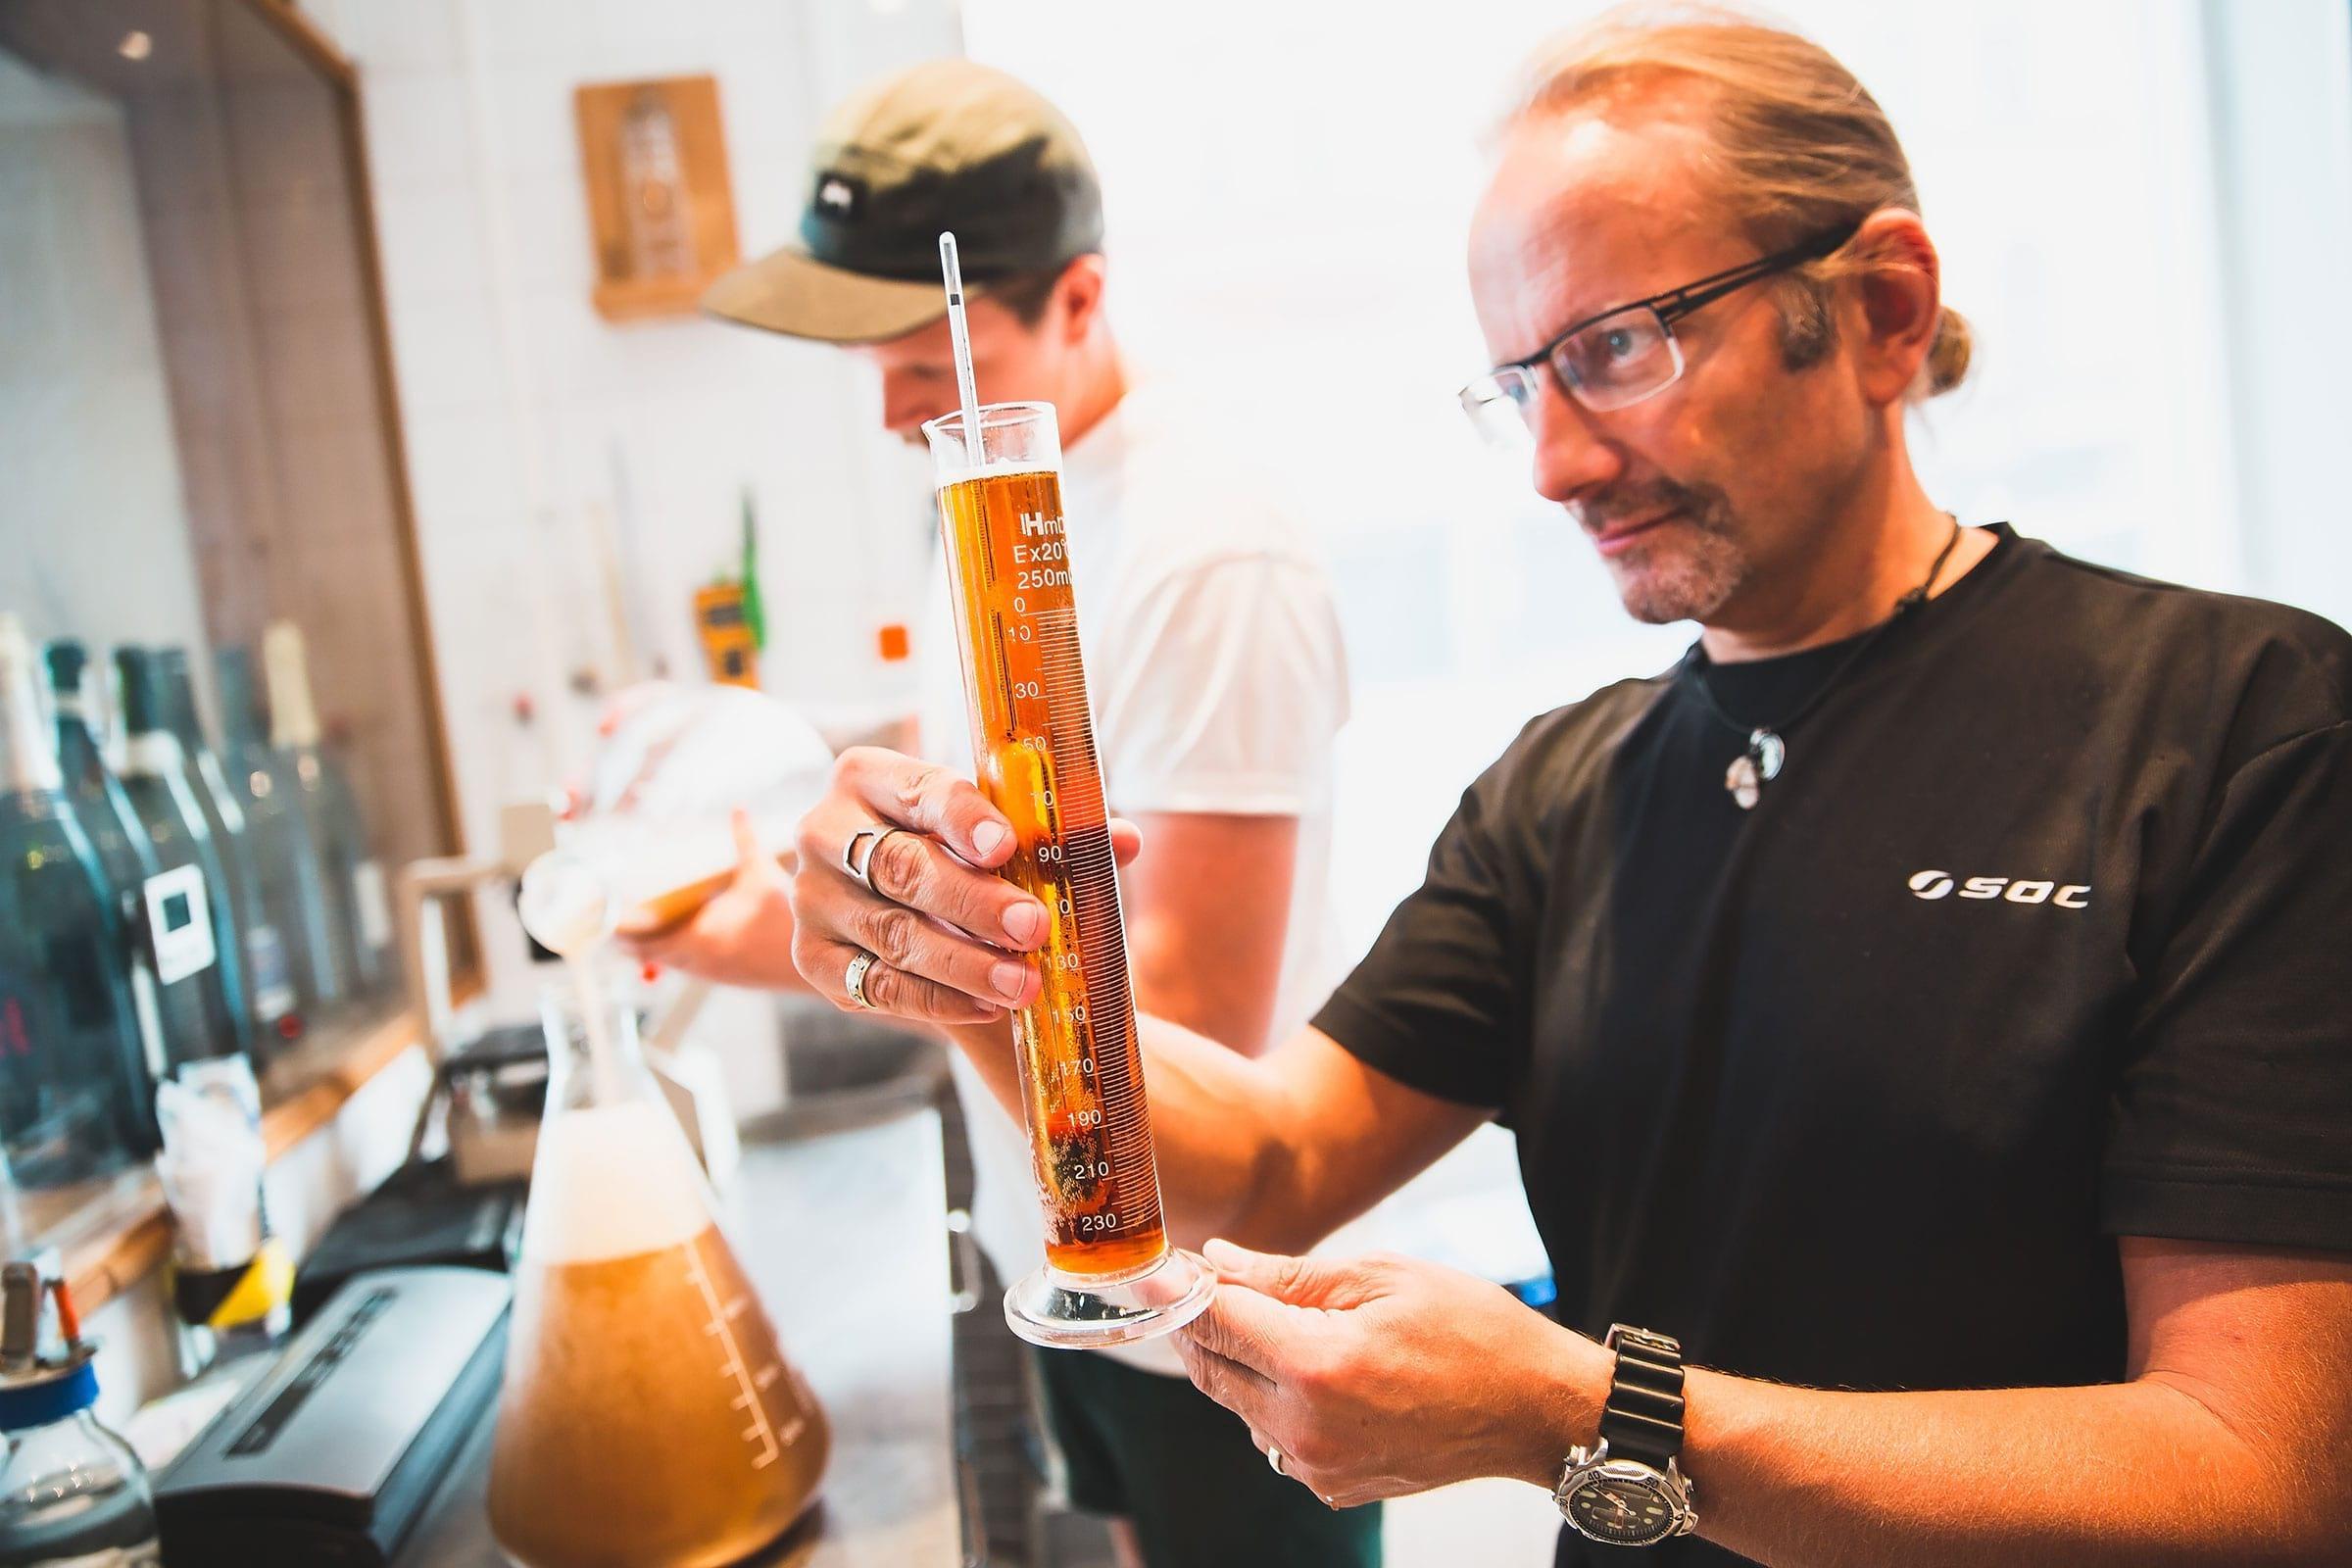 Waza Restaurang & Bryggeri